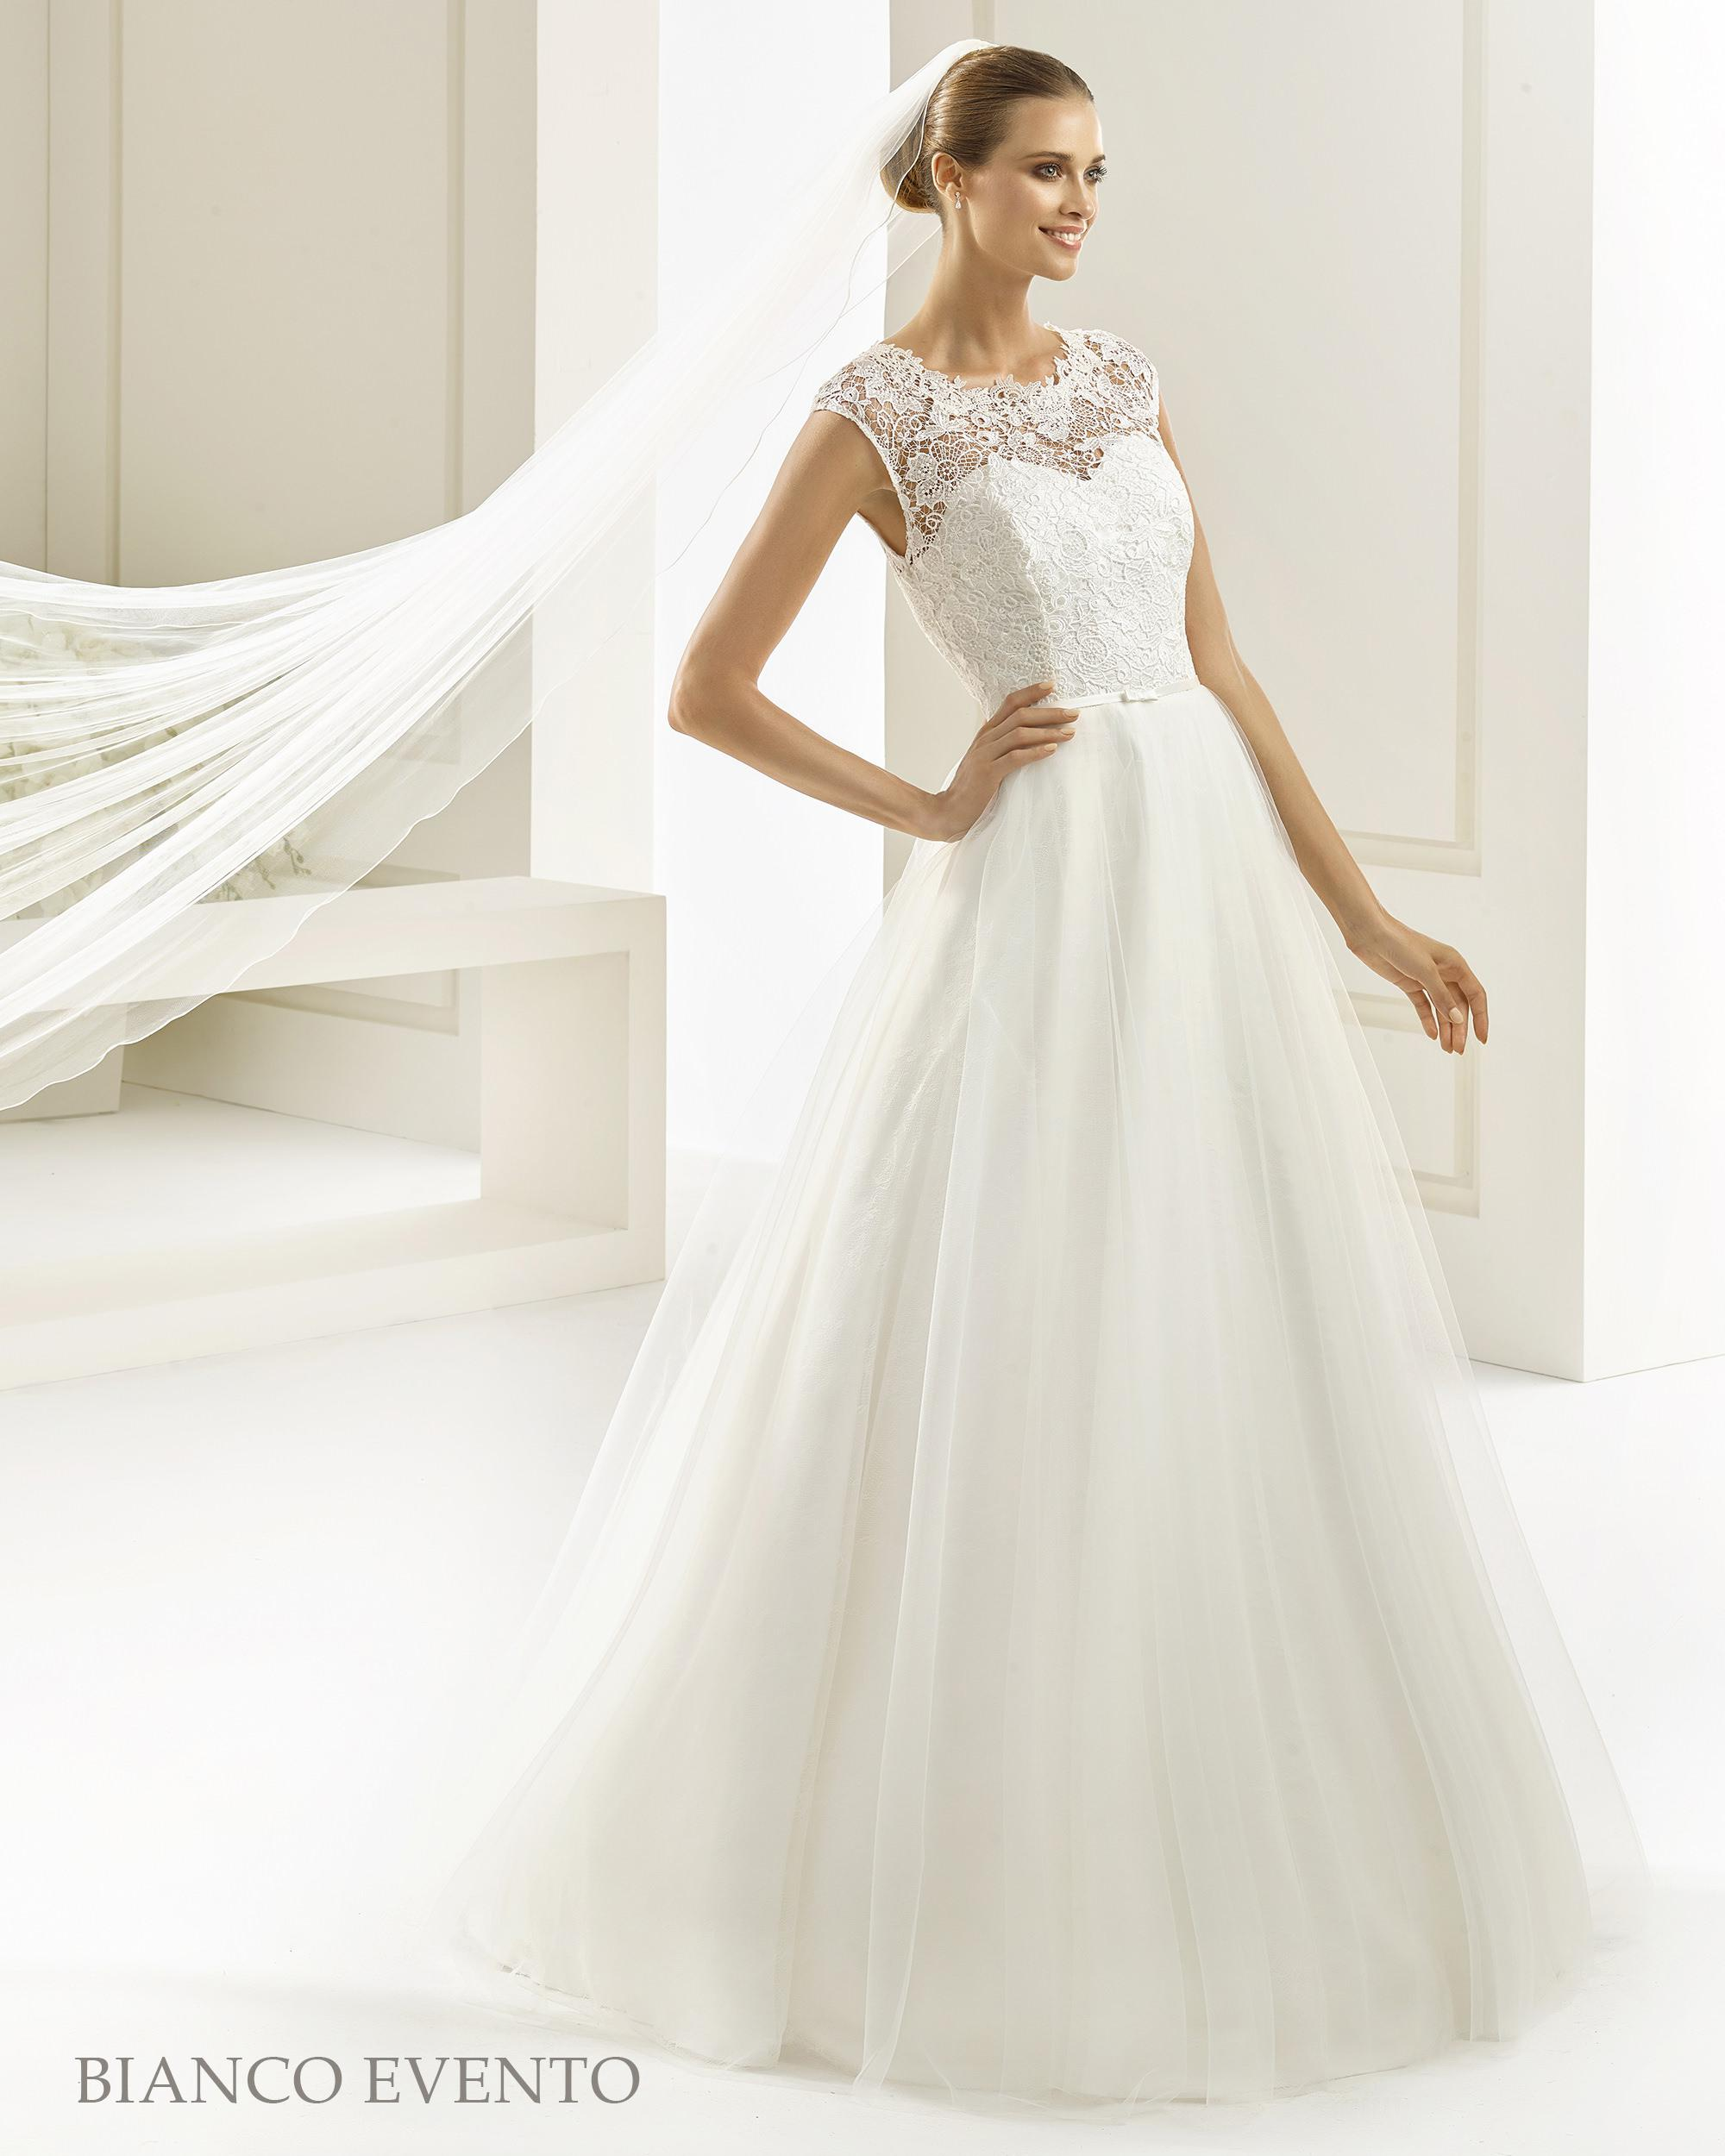 Bianco Evento - Annabel, Ivory: 38